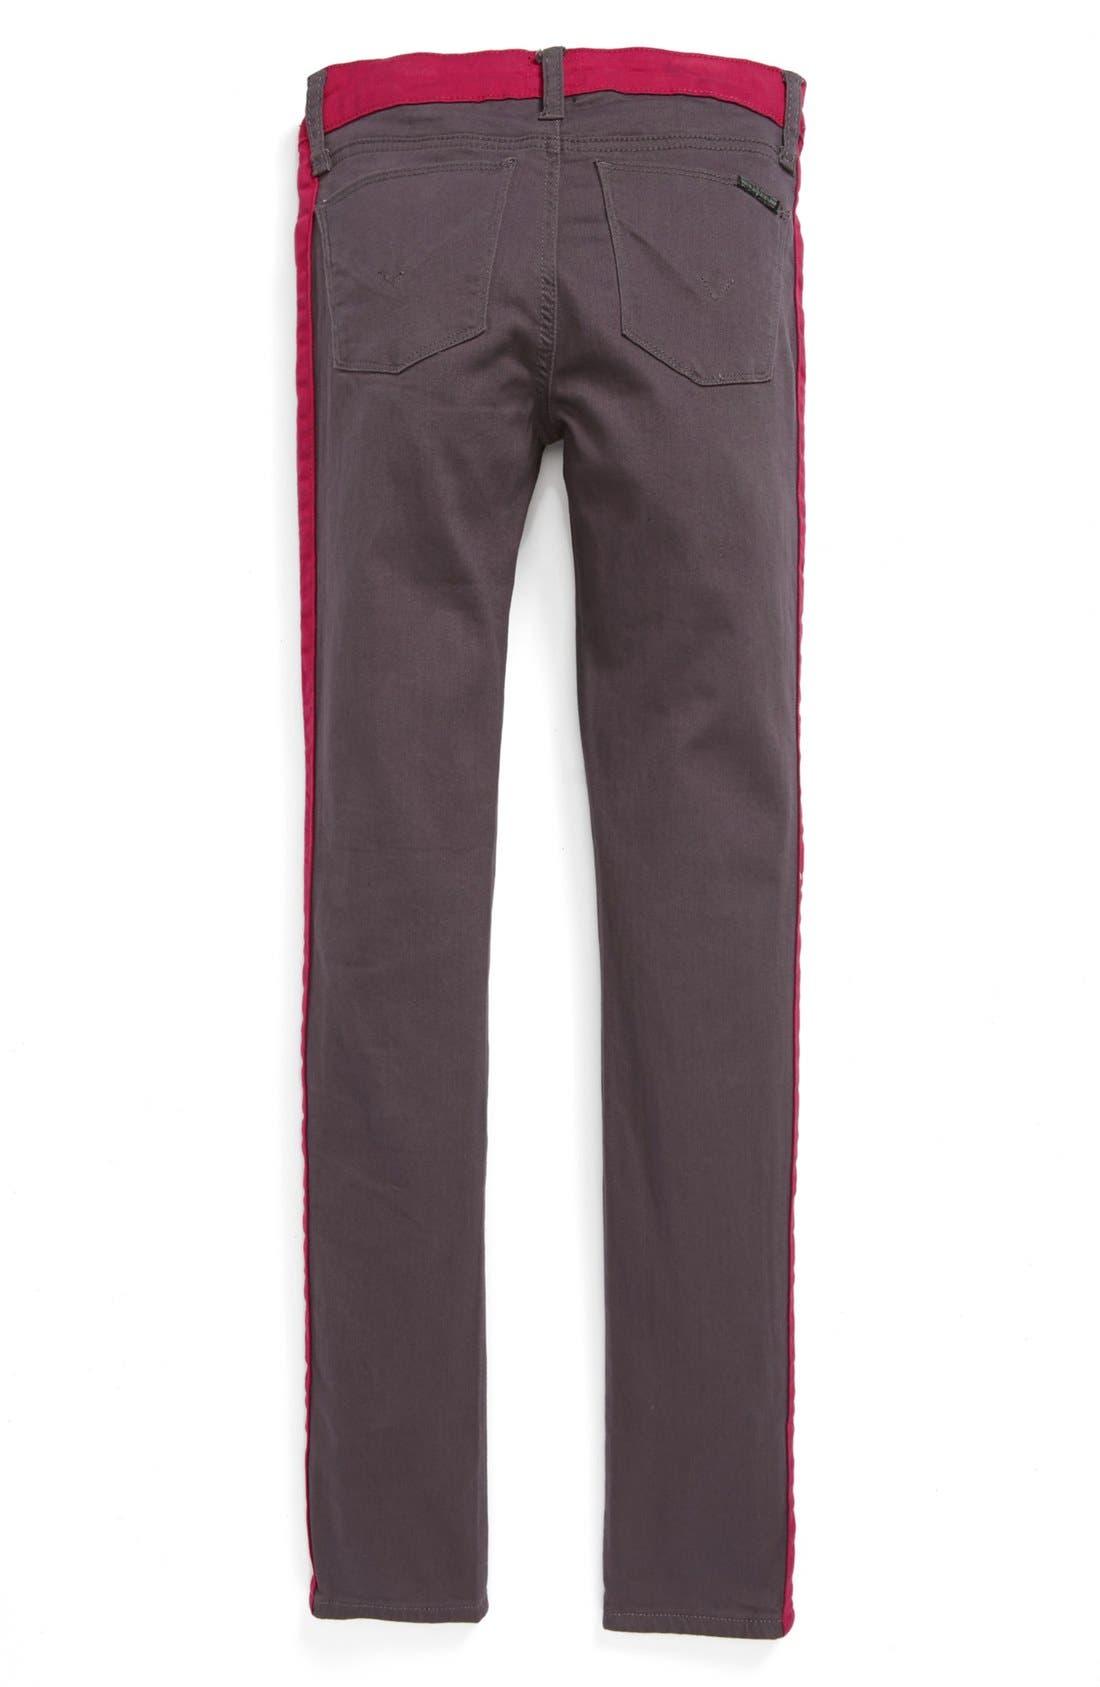 Main Image - Hudson Kids 'Cabbage Floral Leeloo' Skinny Jeans (Big Girls)